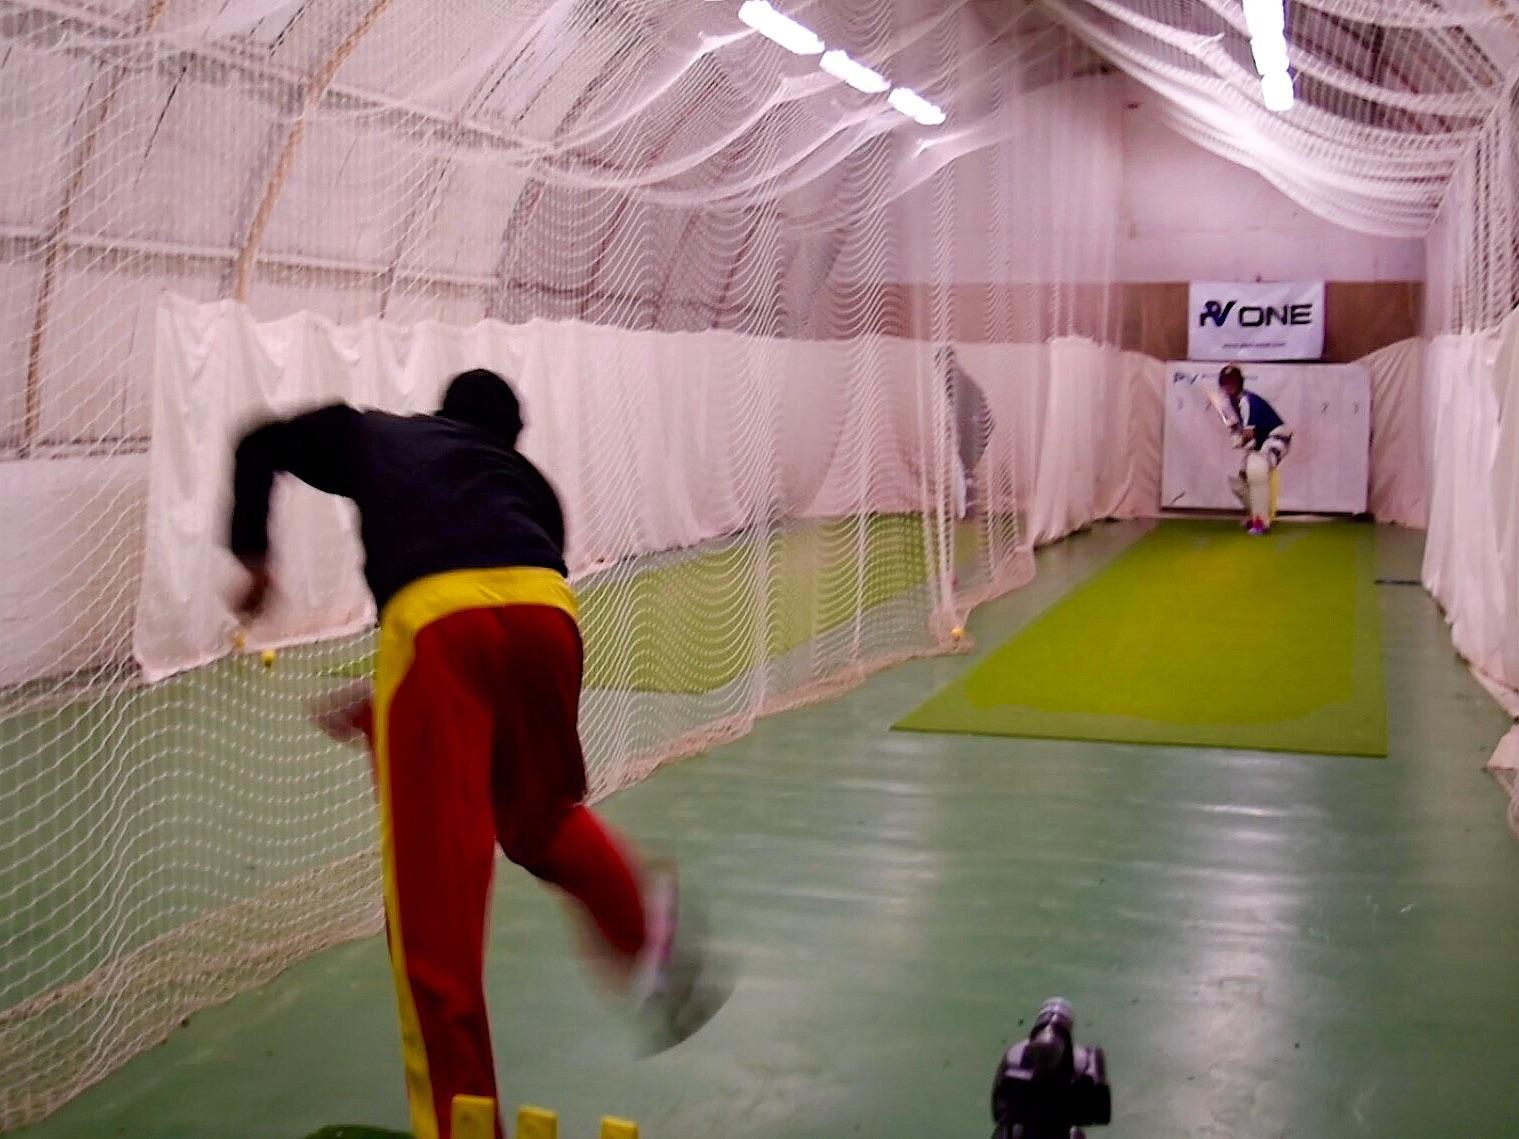 2016 Preseason nets at West of Scotland Cricket Club